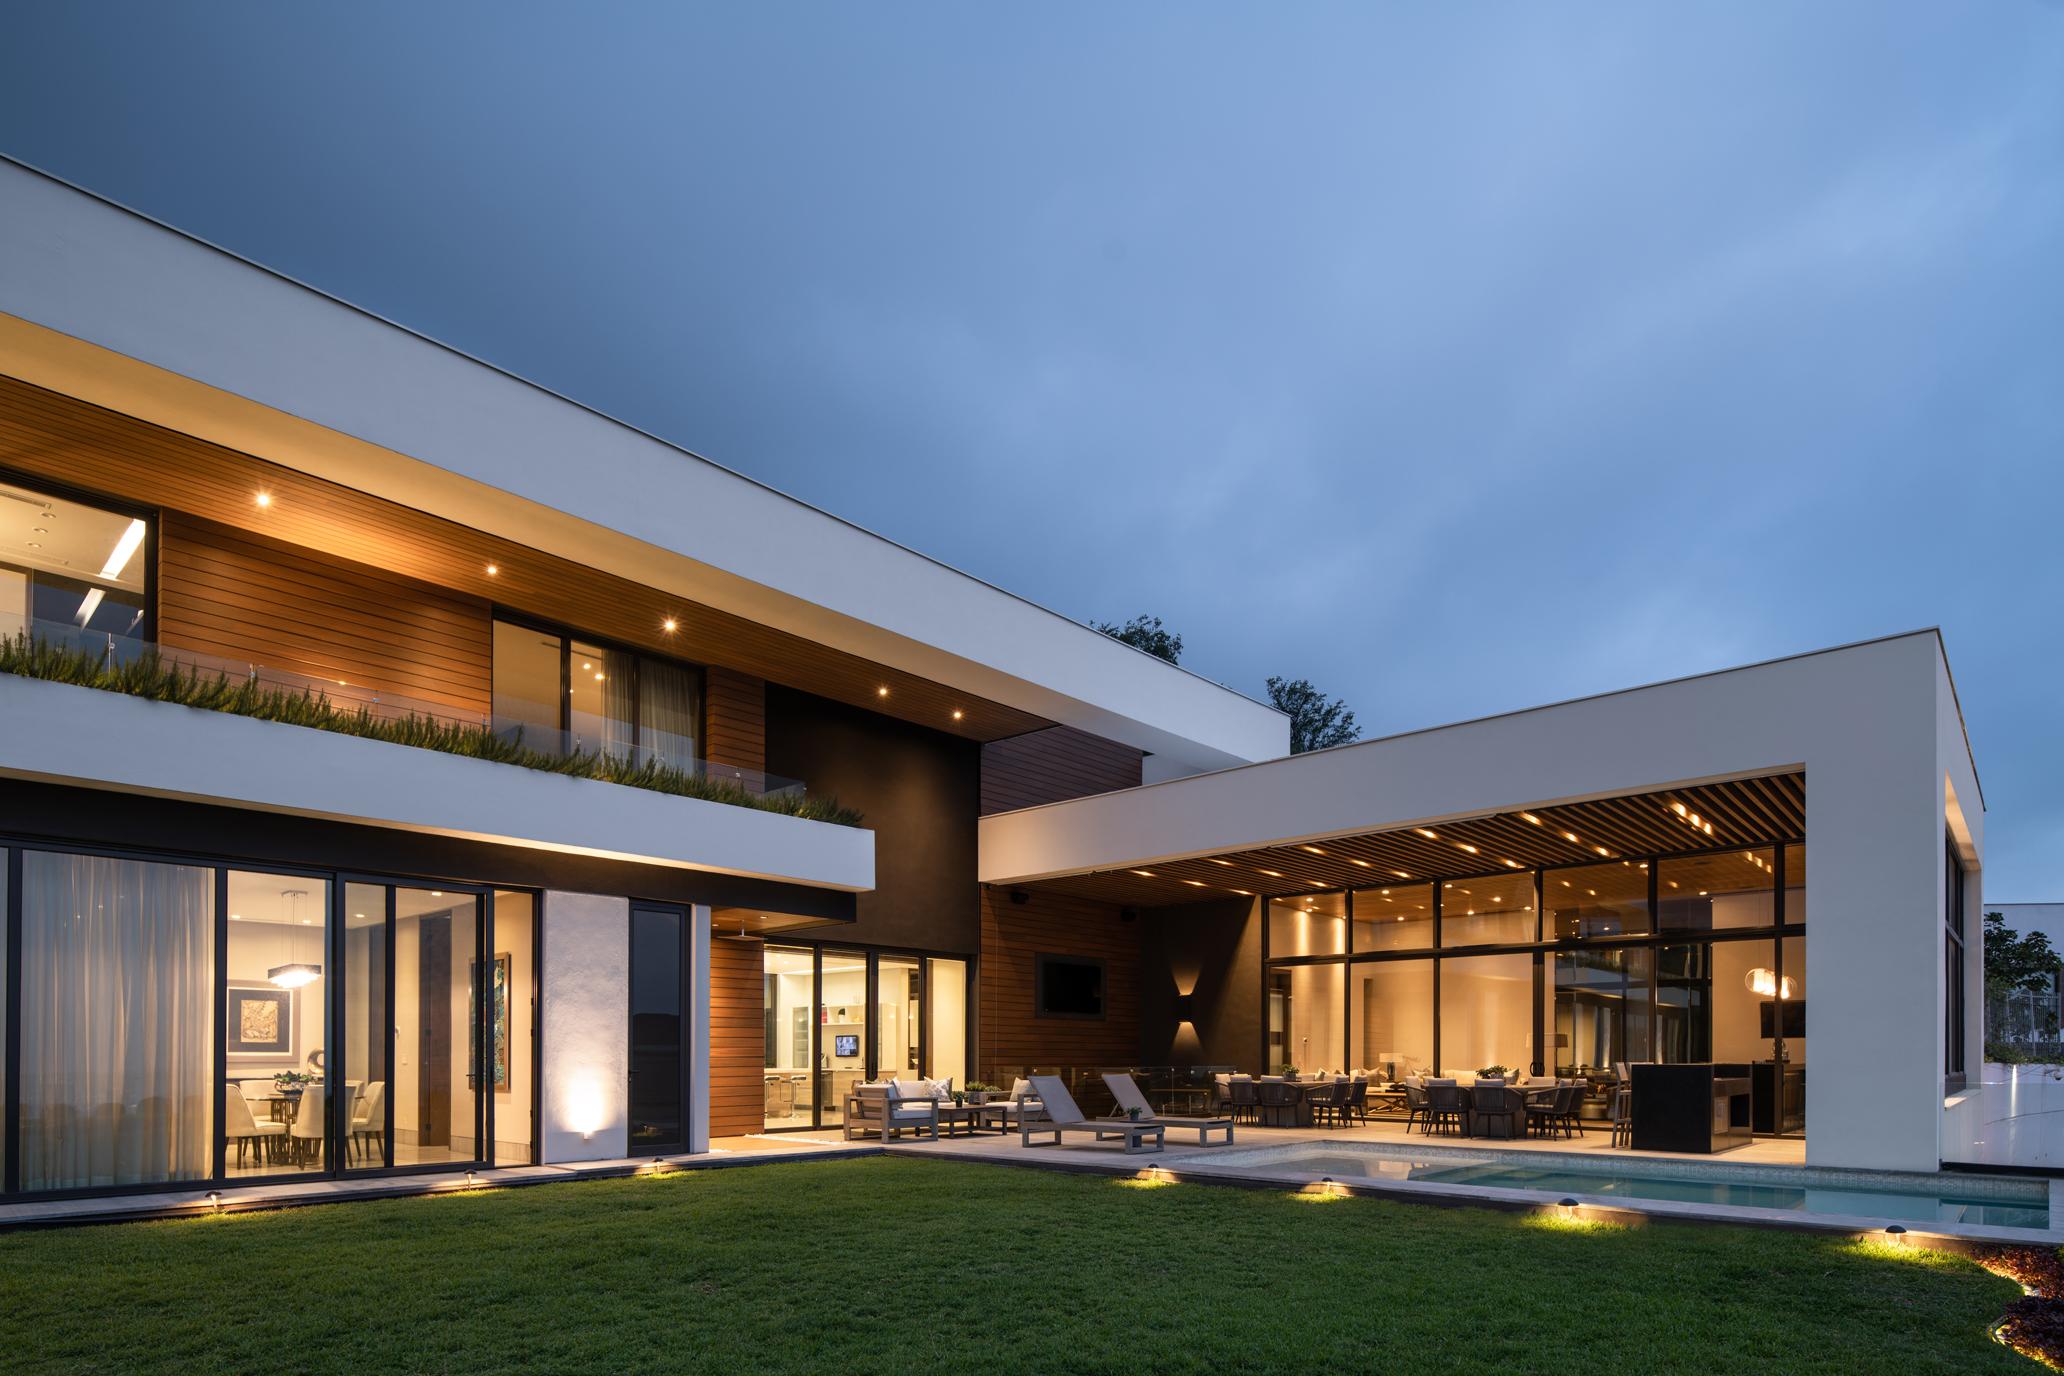 Sierra Chica House